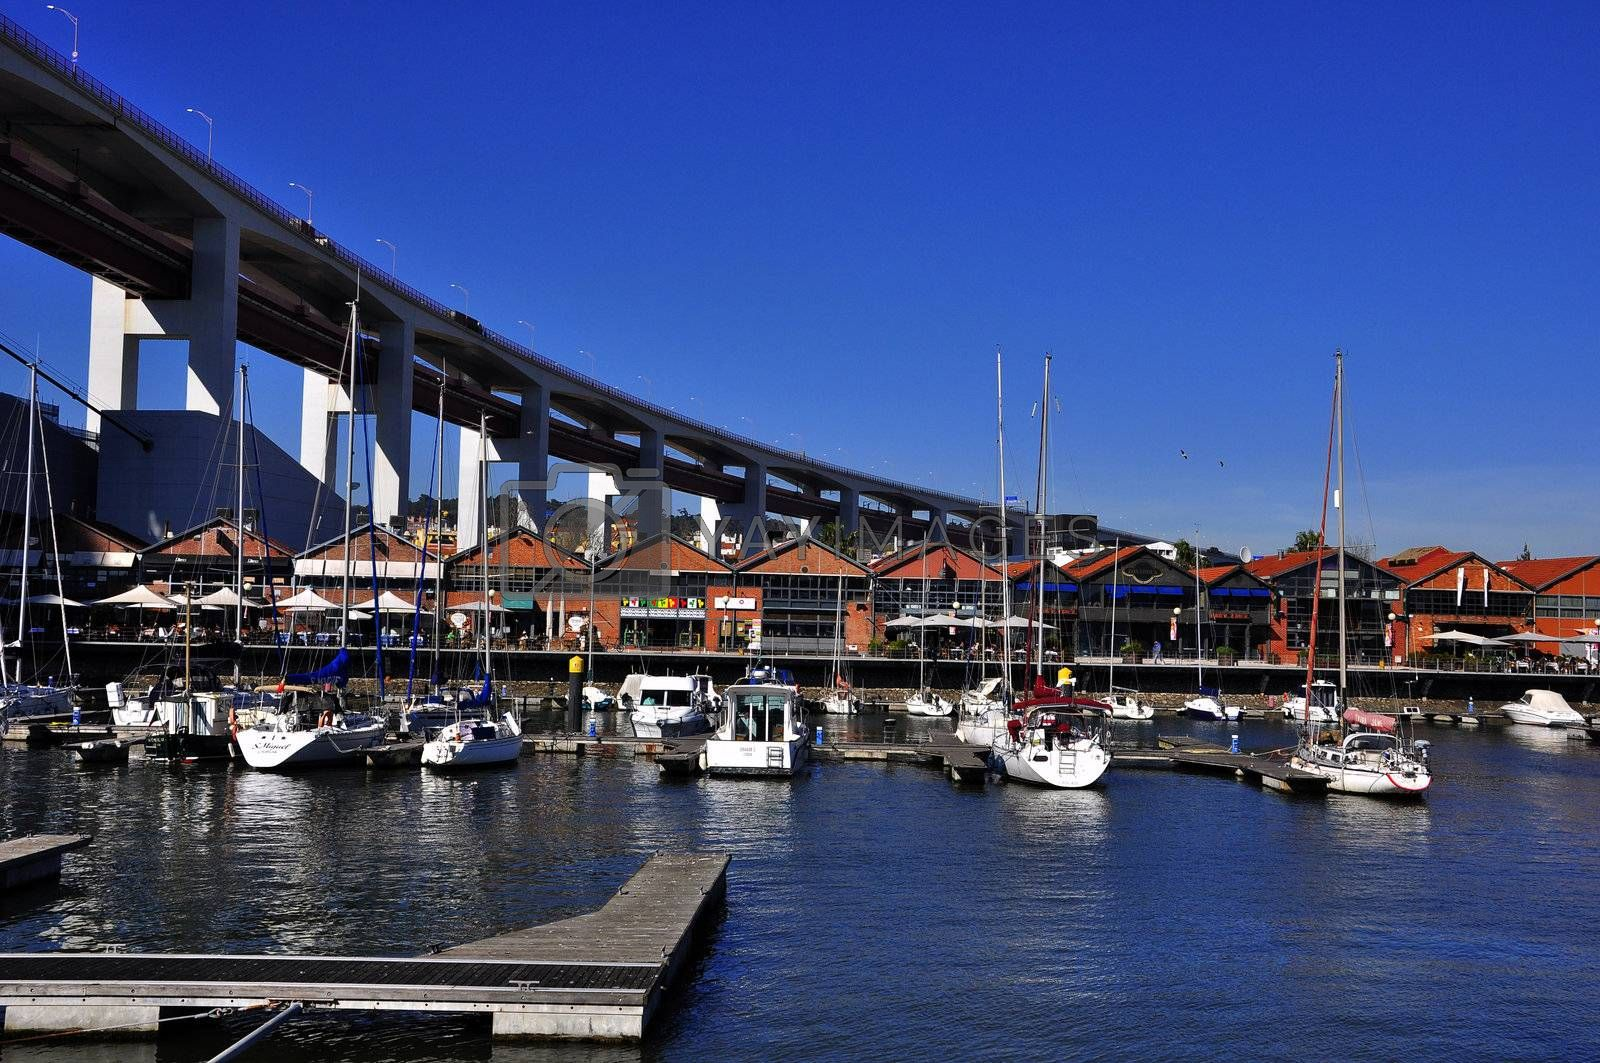 Cove marina, near the bridge on April 25 in Lisbon